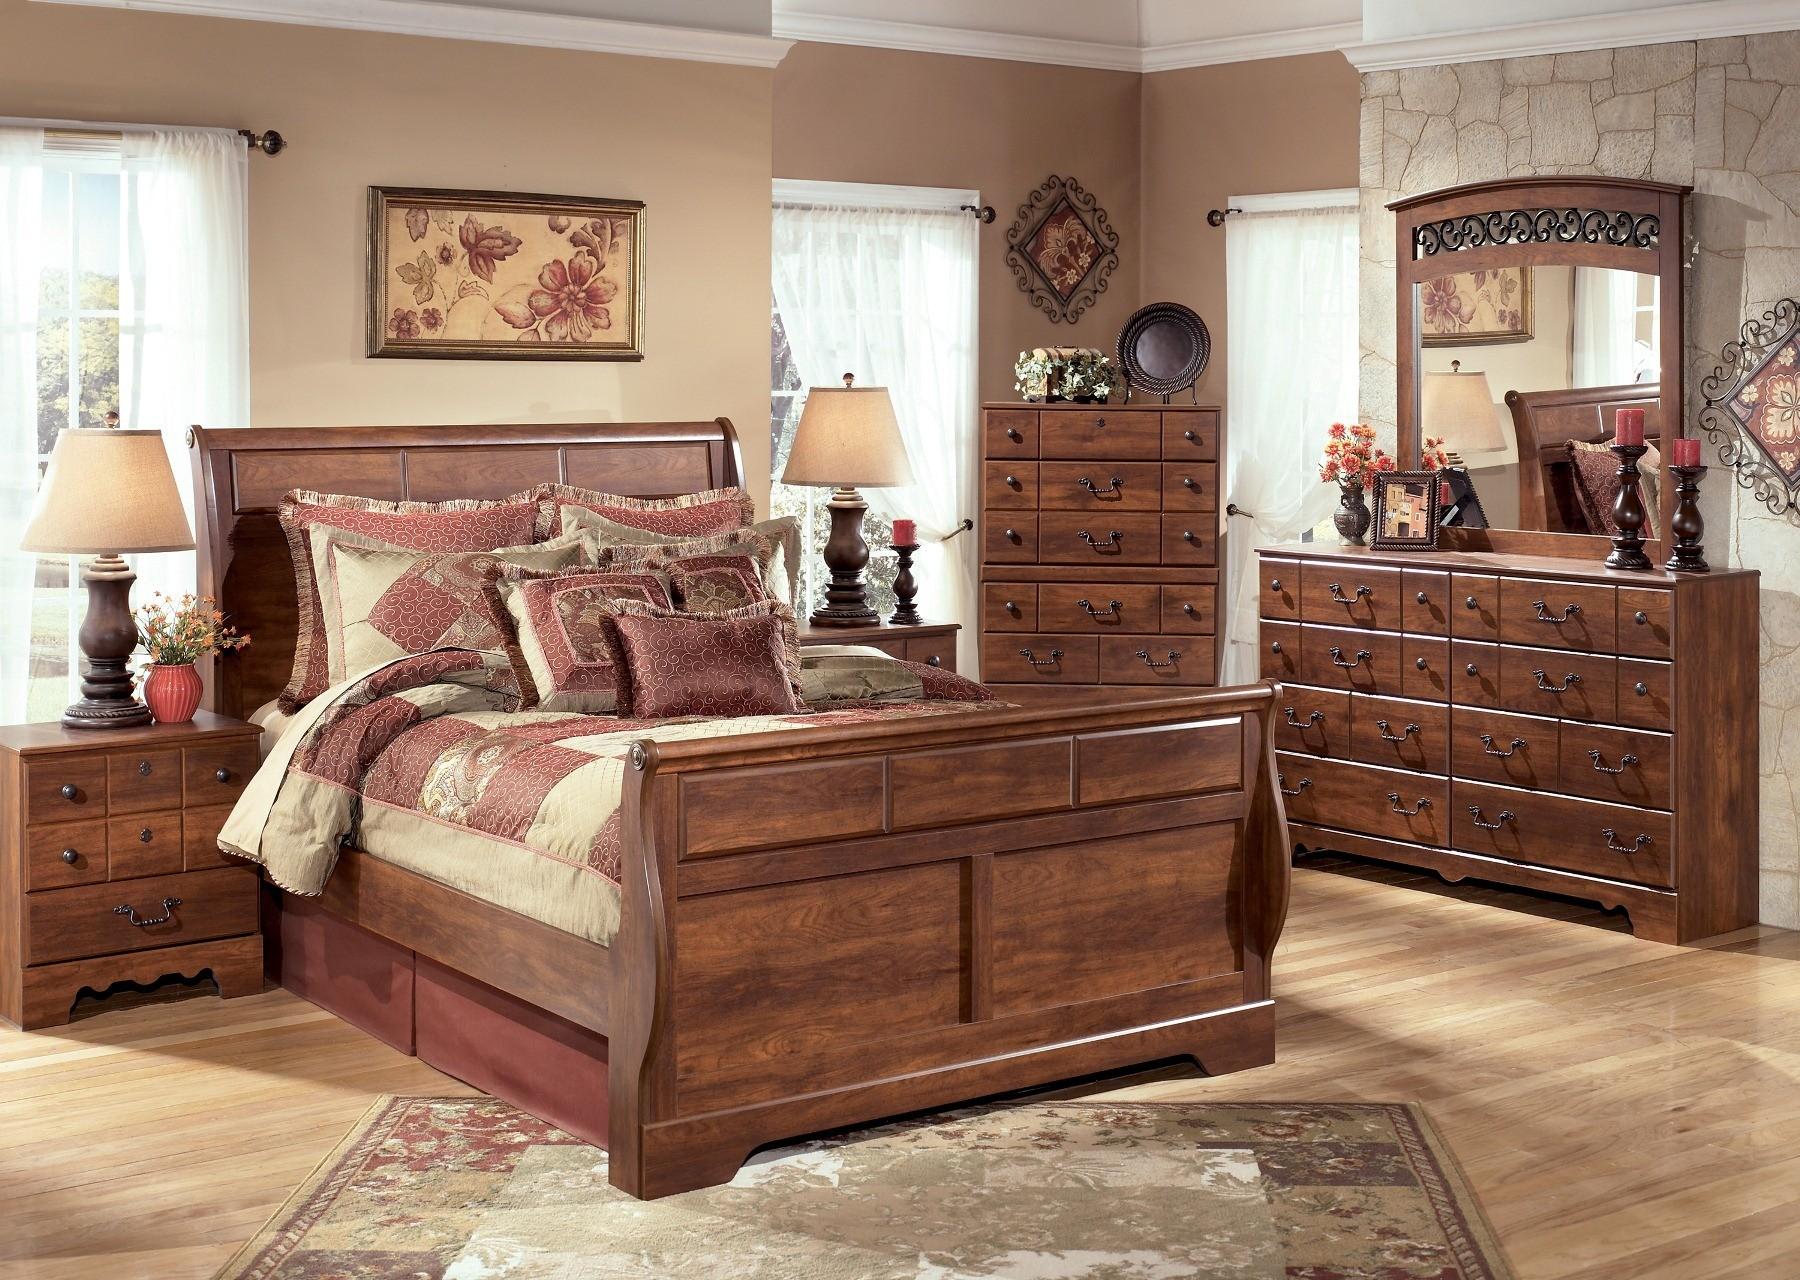 timberline sleigh bedroom set from ashley b258sl